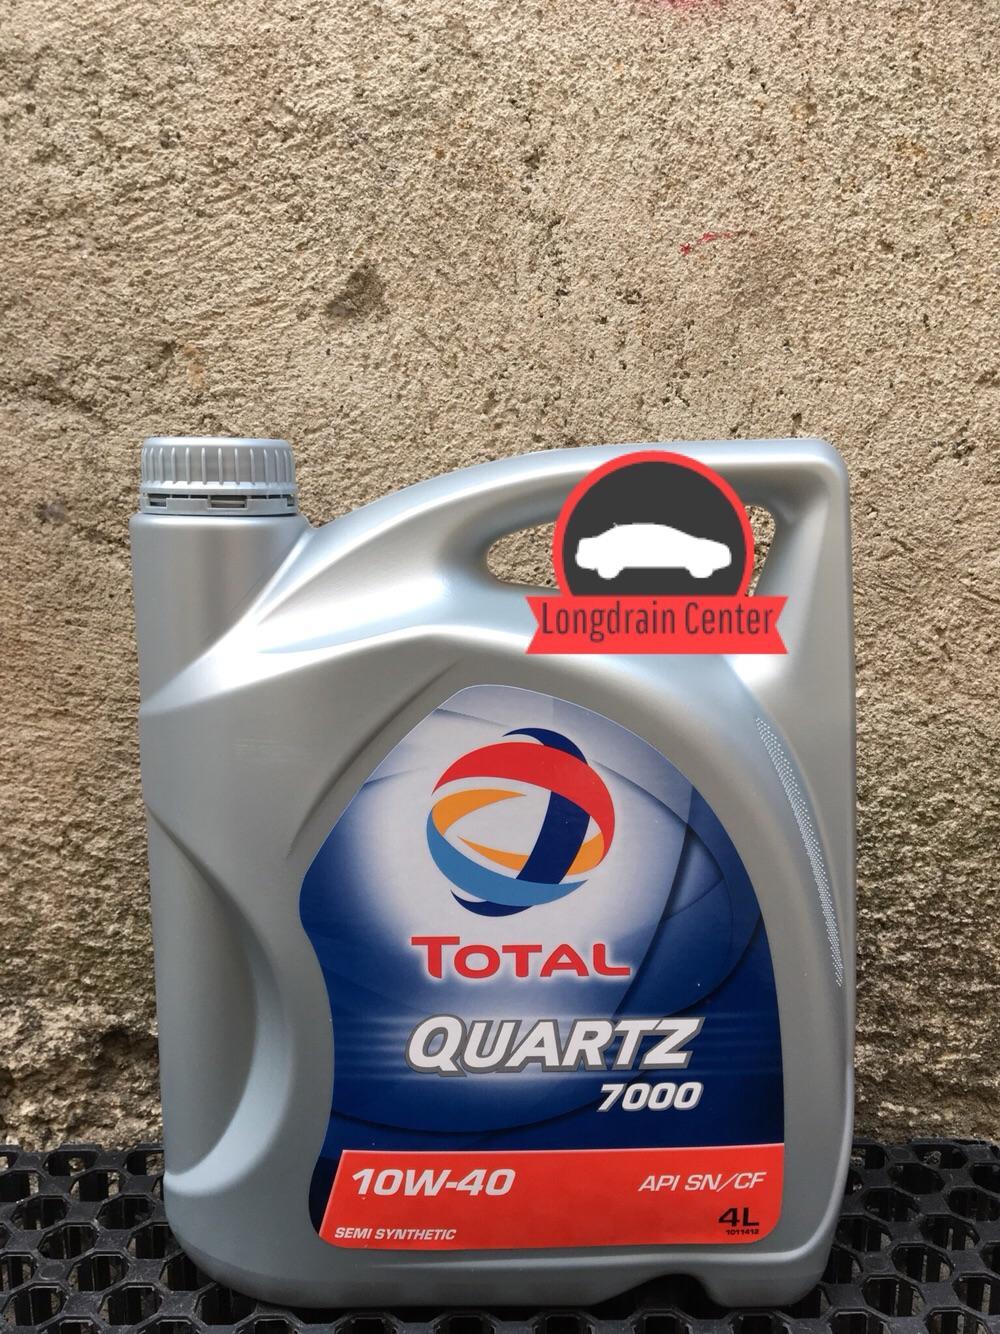 Oli Pelumas Kendaraan Bermotor Shell Helix Ultra 5w 40 Api Sn Cf Fully Synthetic Oil Mesin Mobil 4 Liter Total Quartz 7000 10w40